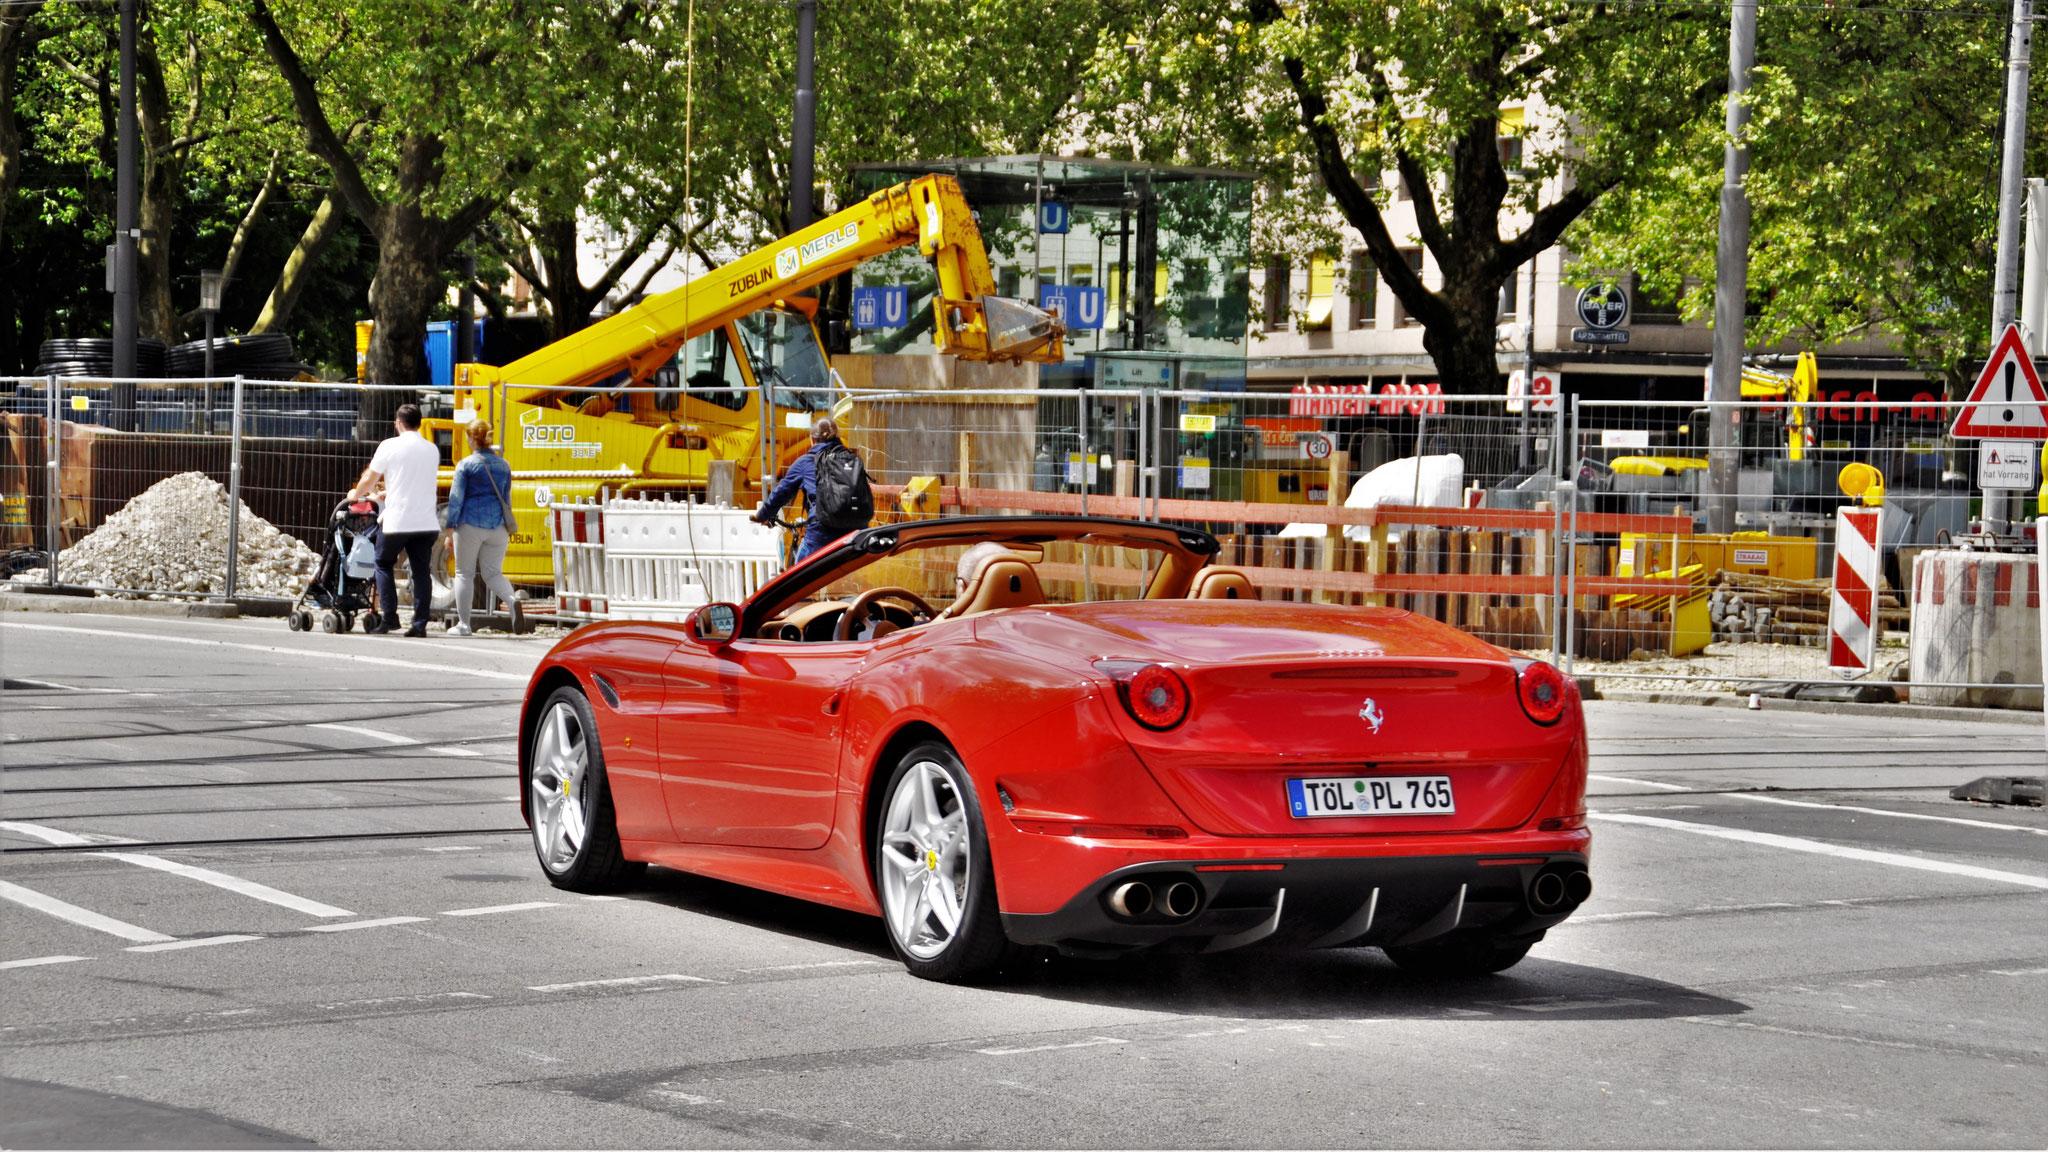 Ferrari California T - TÖL-PL-765